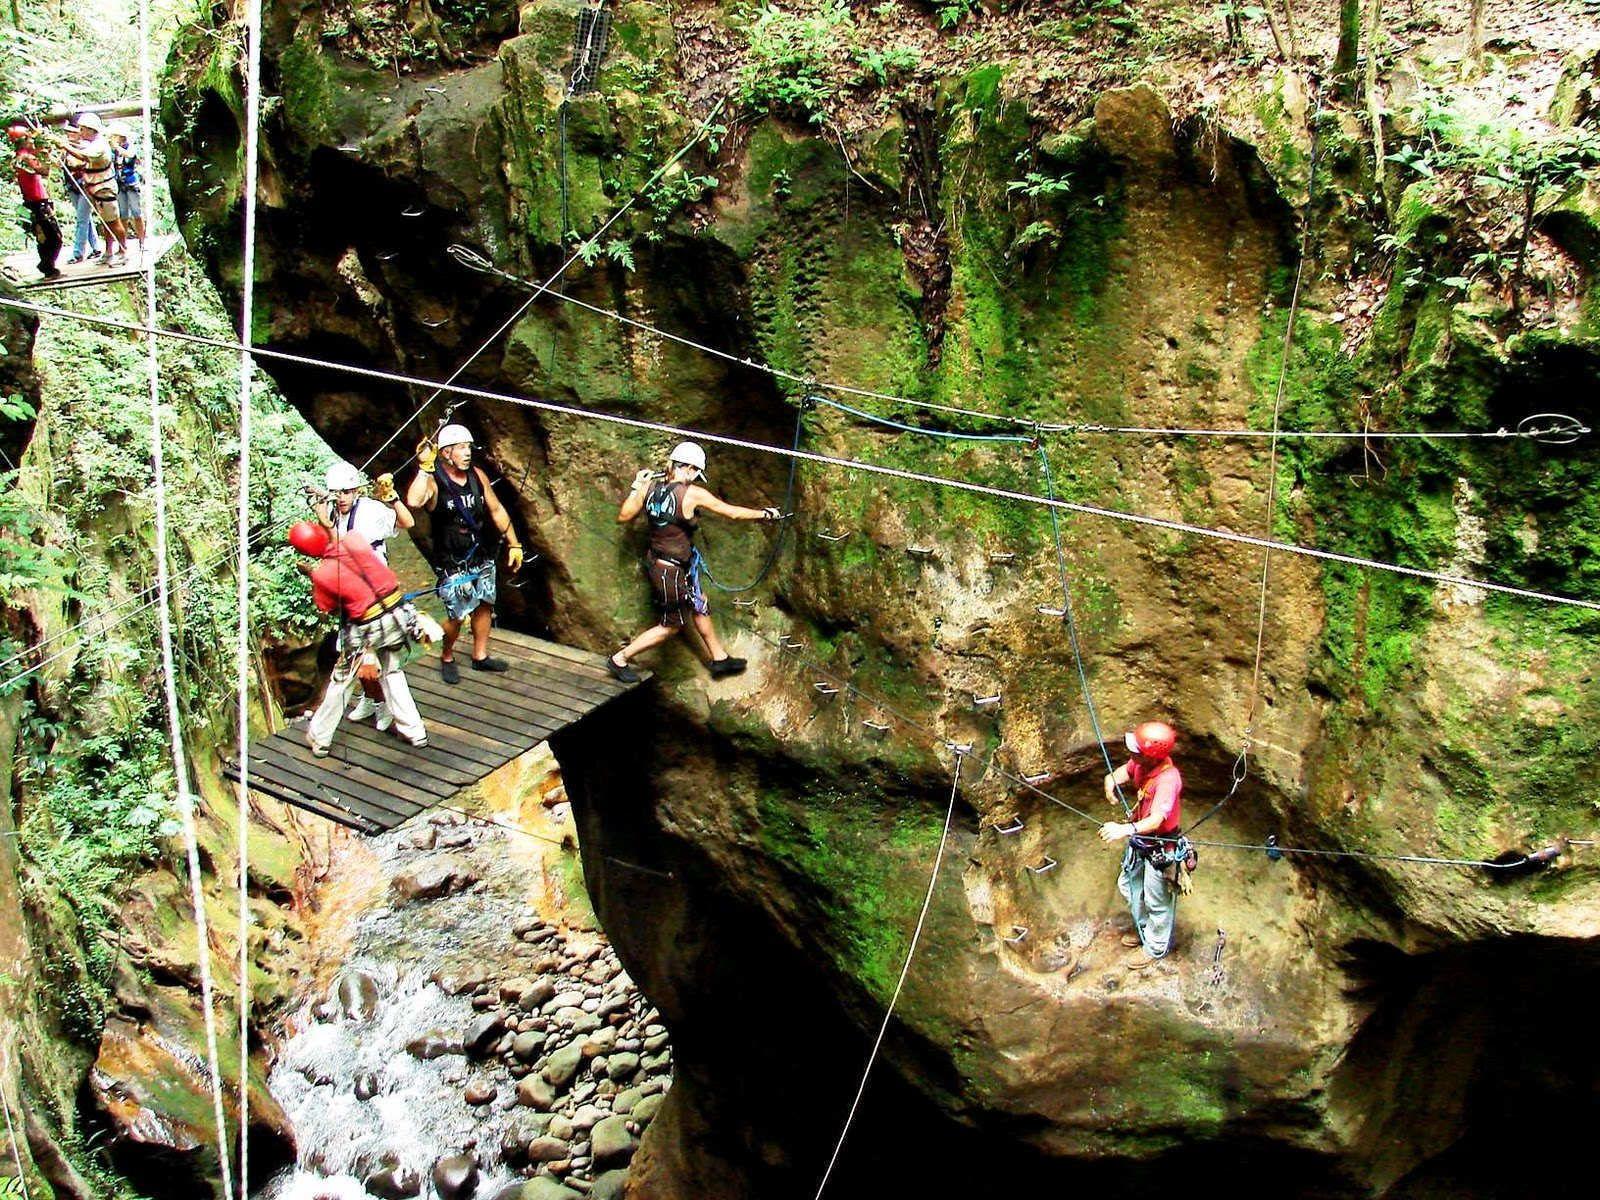 Guachipelin Adventure Zipline Horseback River Tubing Combo